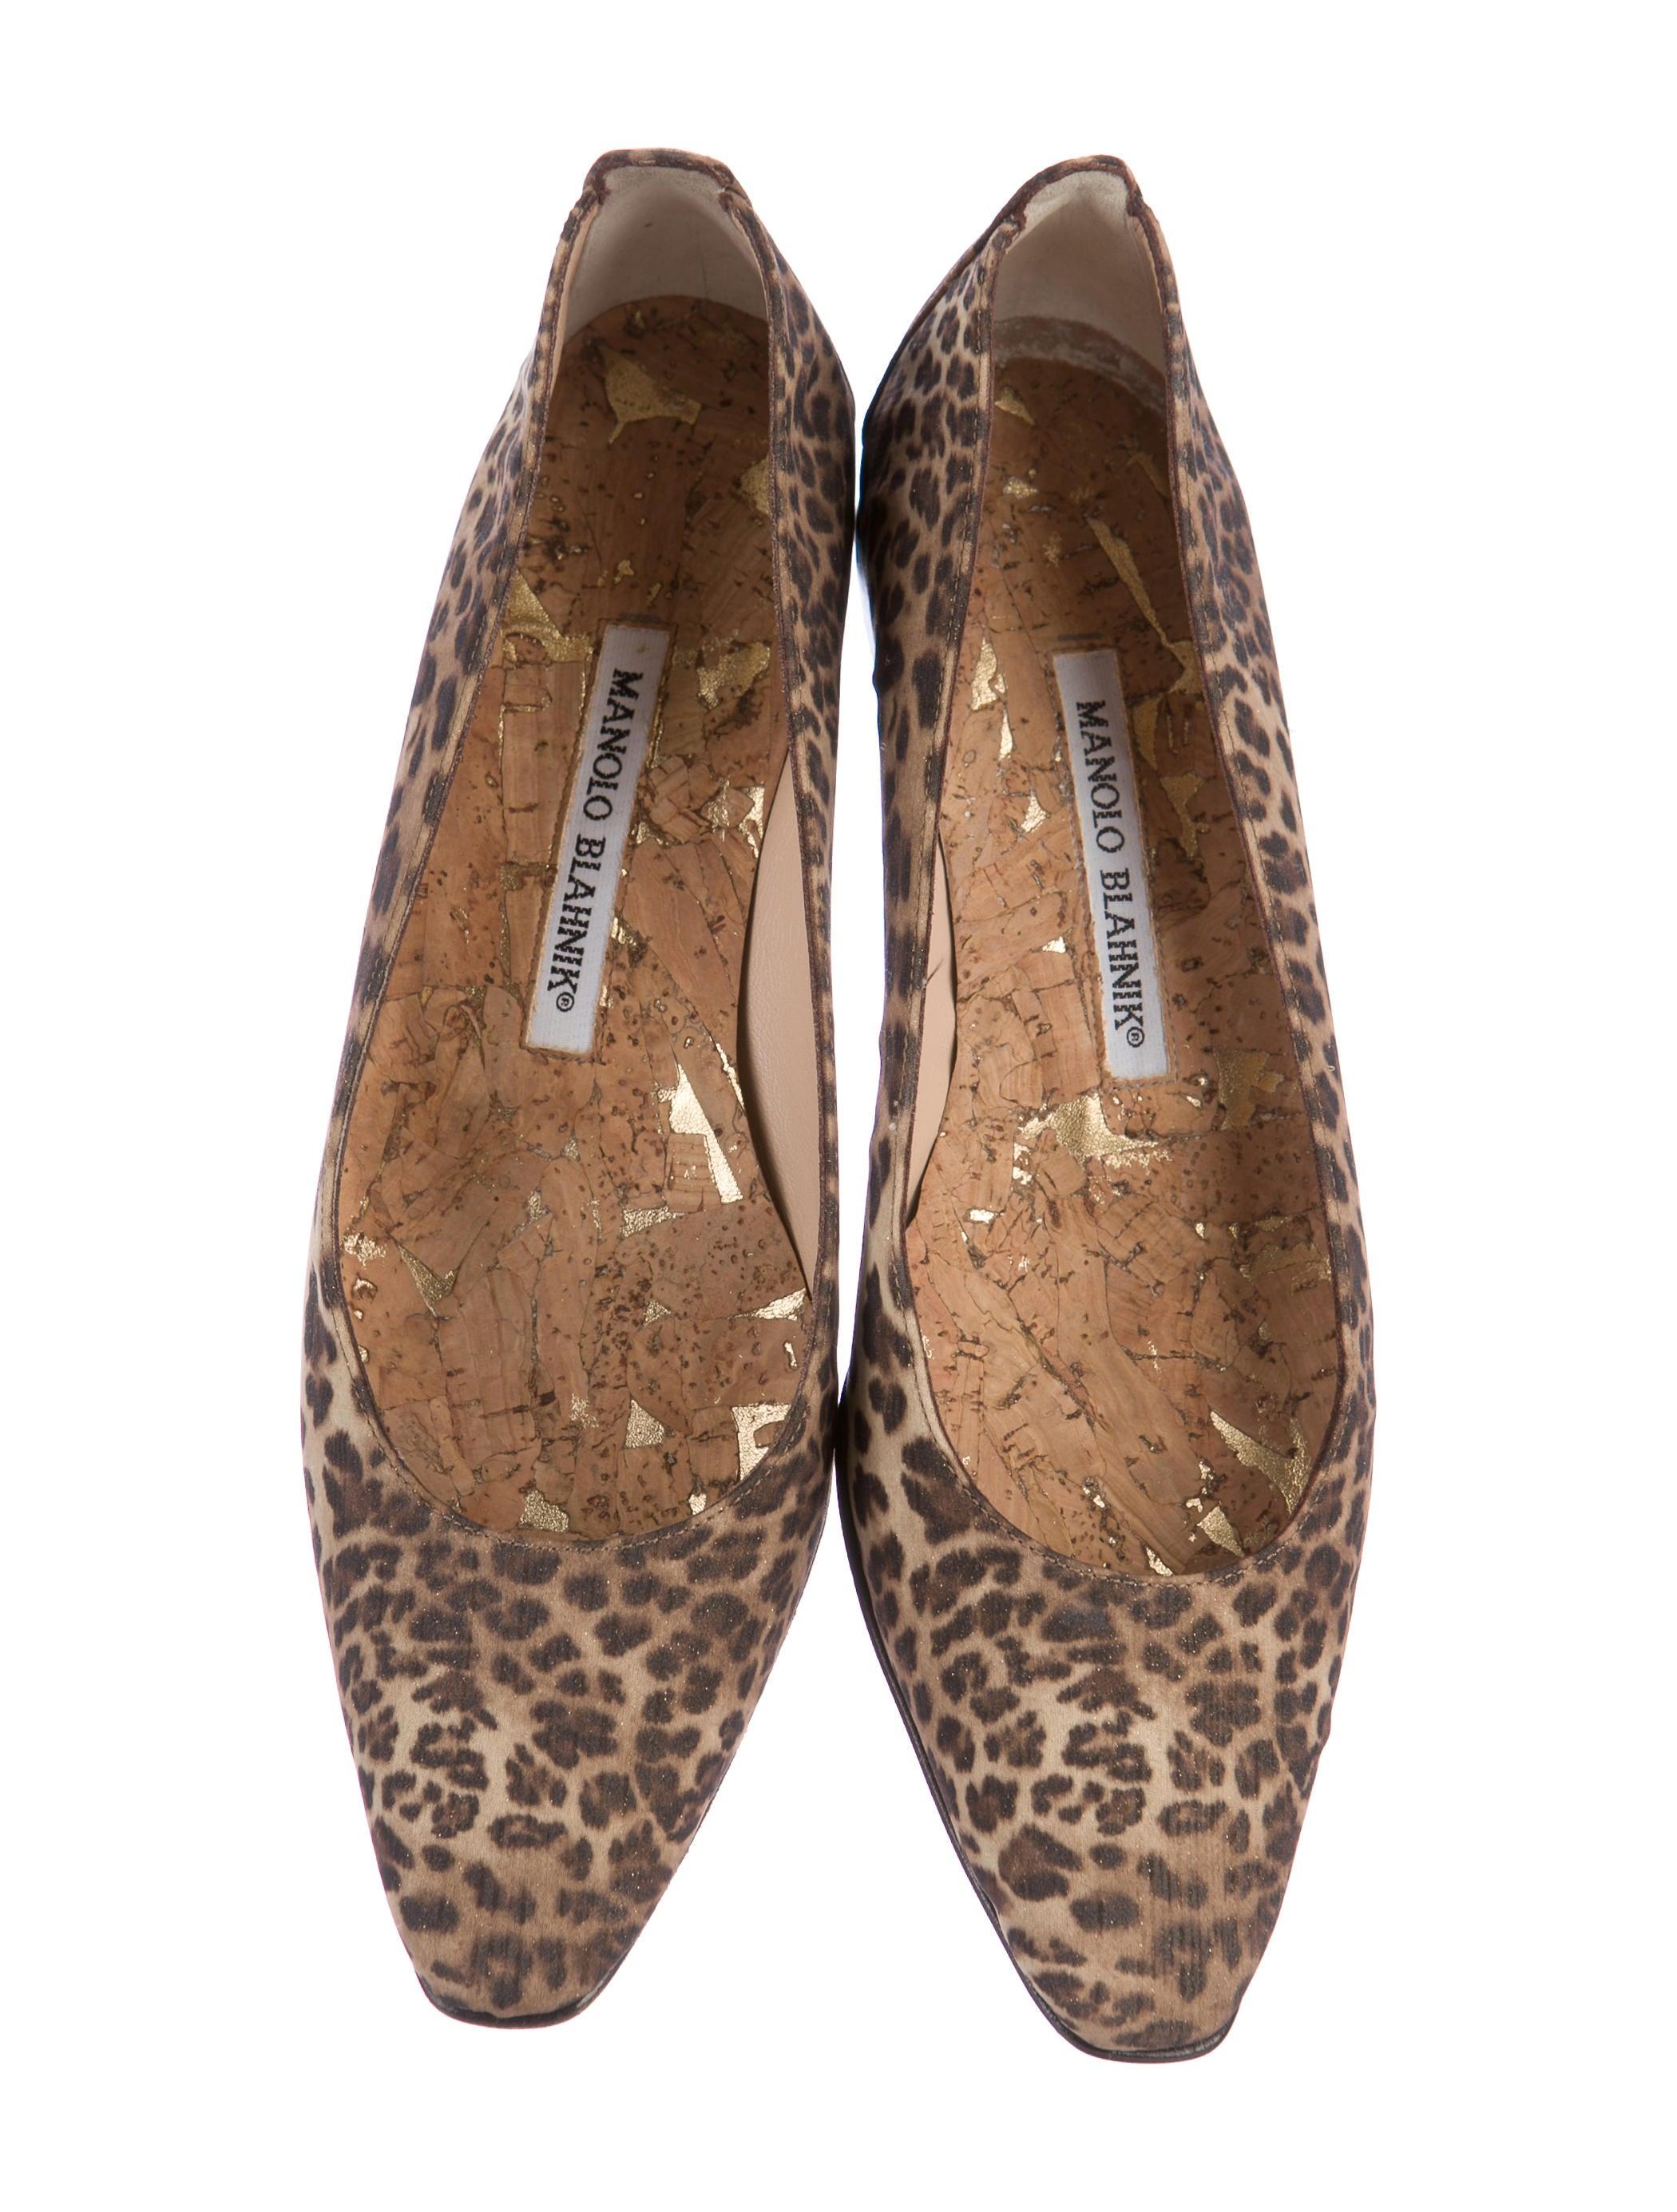 New listing Clarks cushion soft leopard print pony skin flats ballet pumps UK 7 VGC.